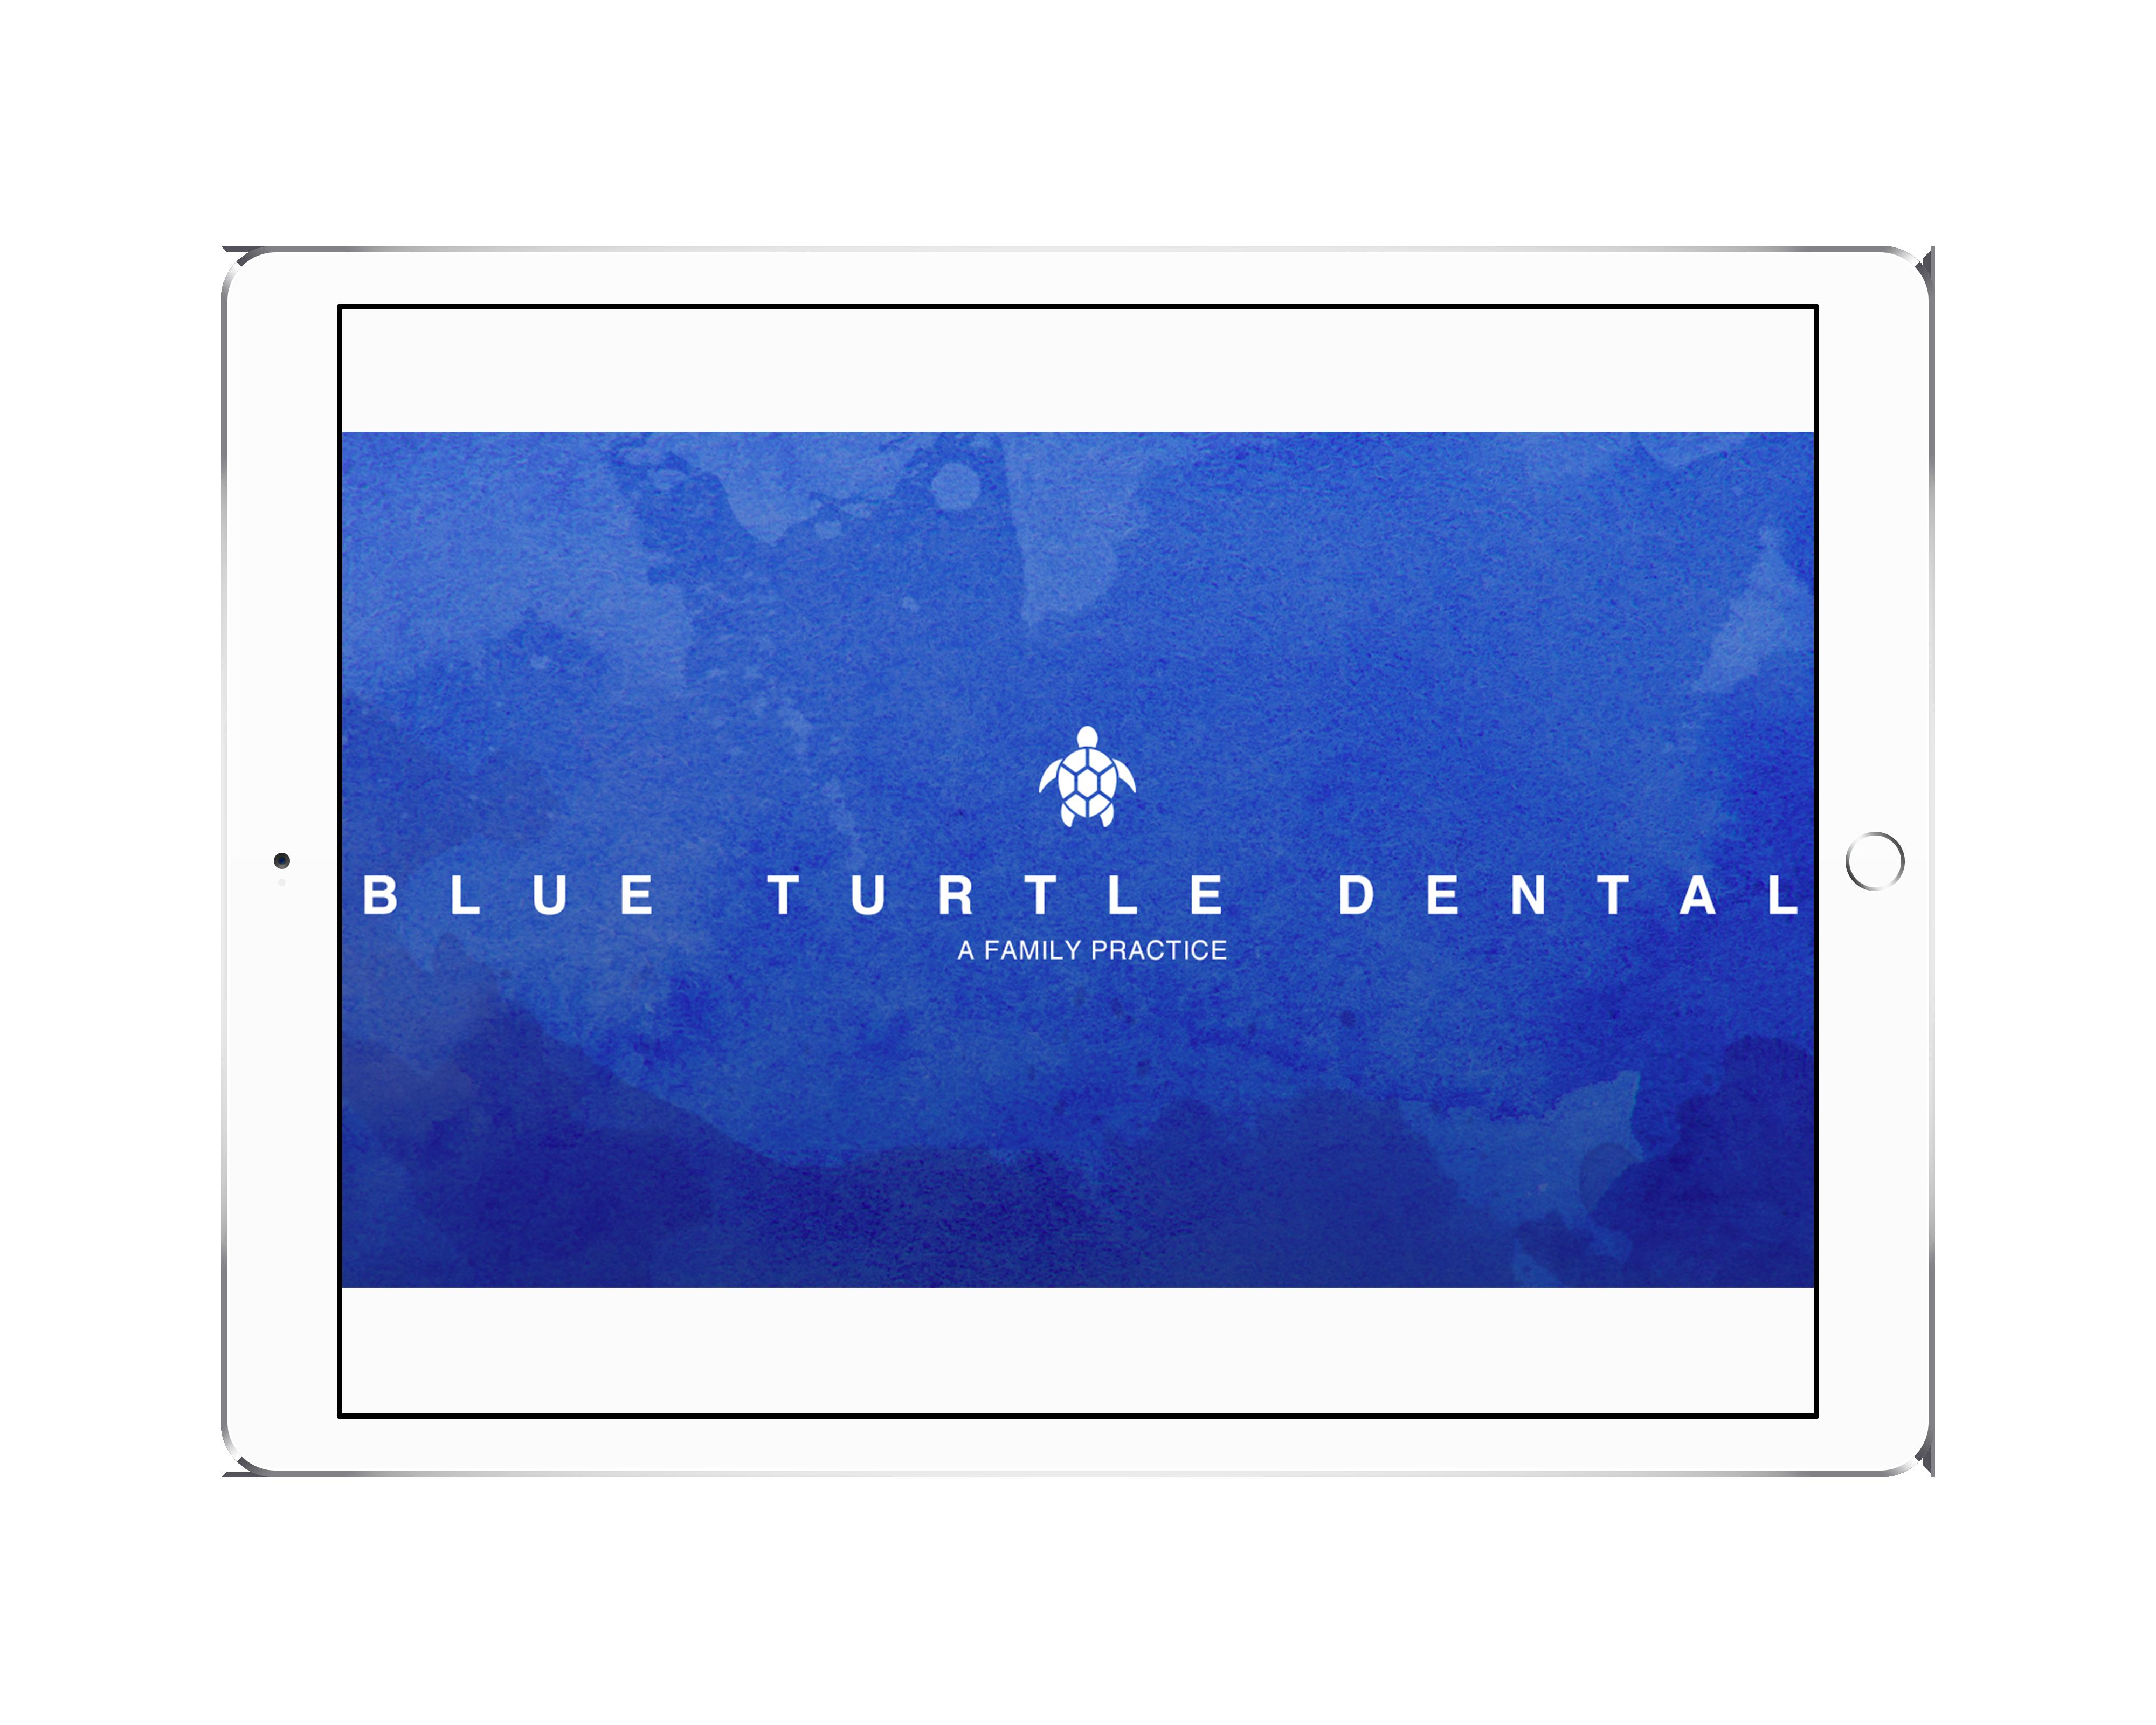 Brand Identity & Website Development for Blue Turtle Dental